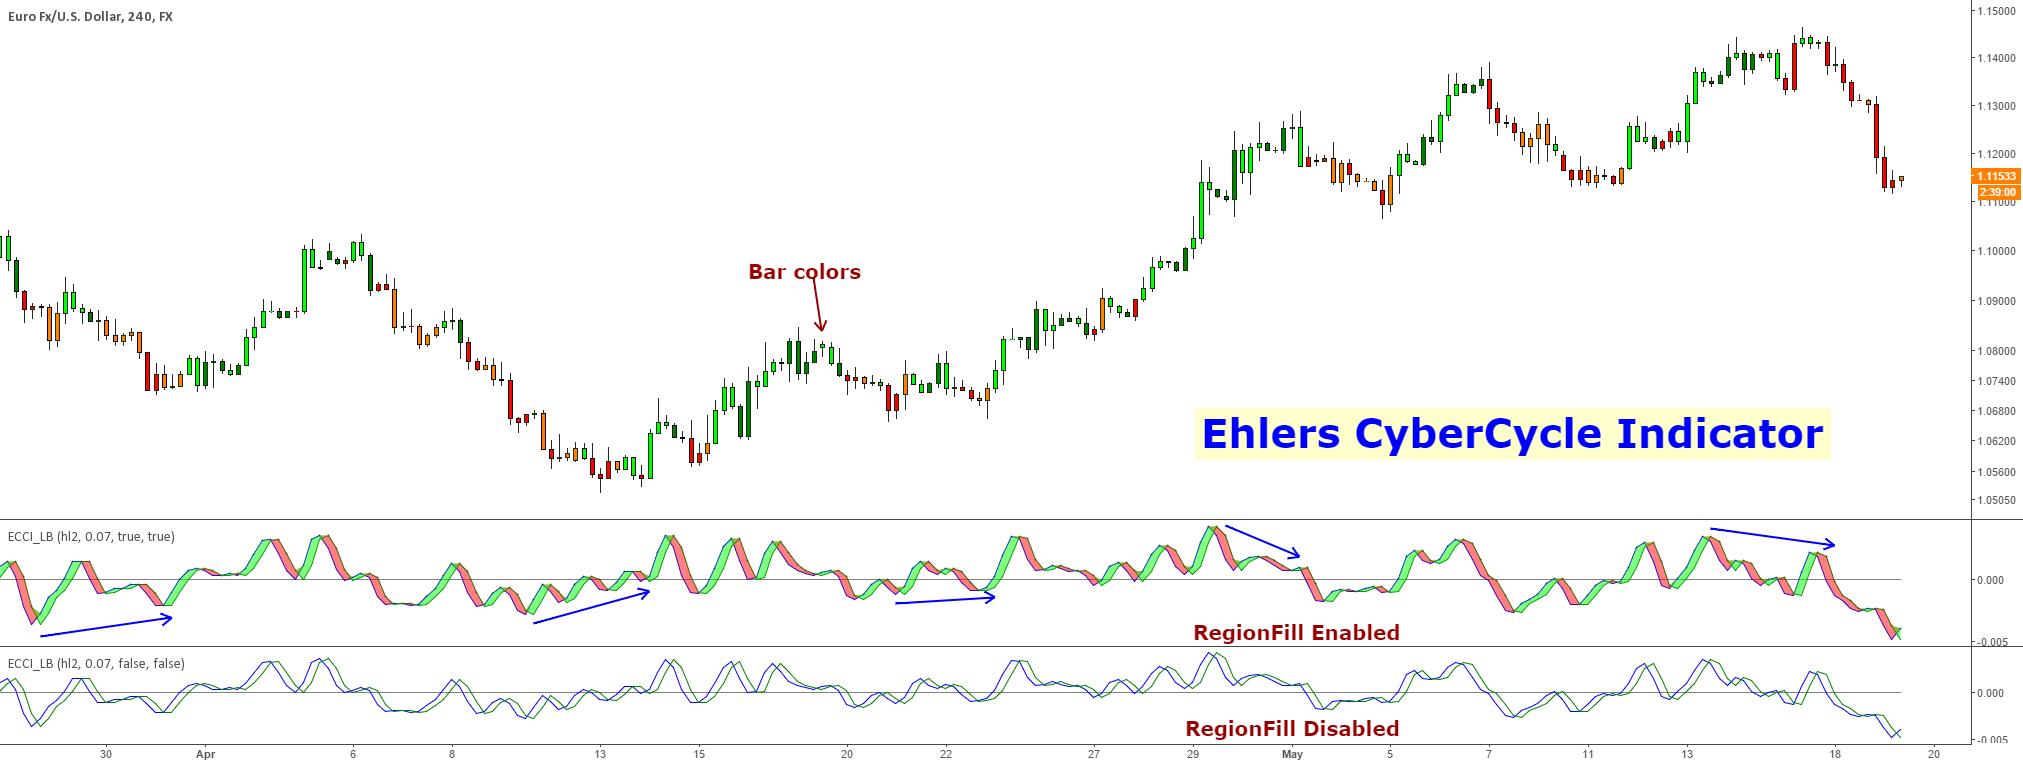 Ehlers Cyber Cycle Indicator [LazyBear]